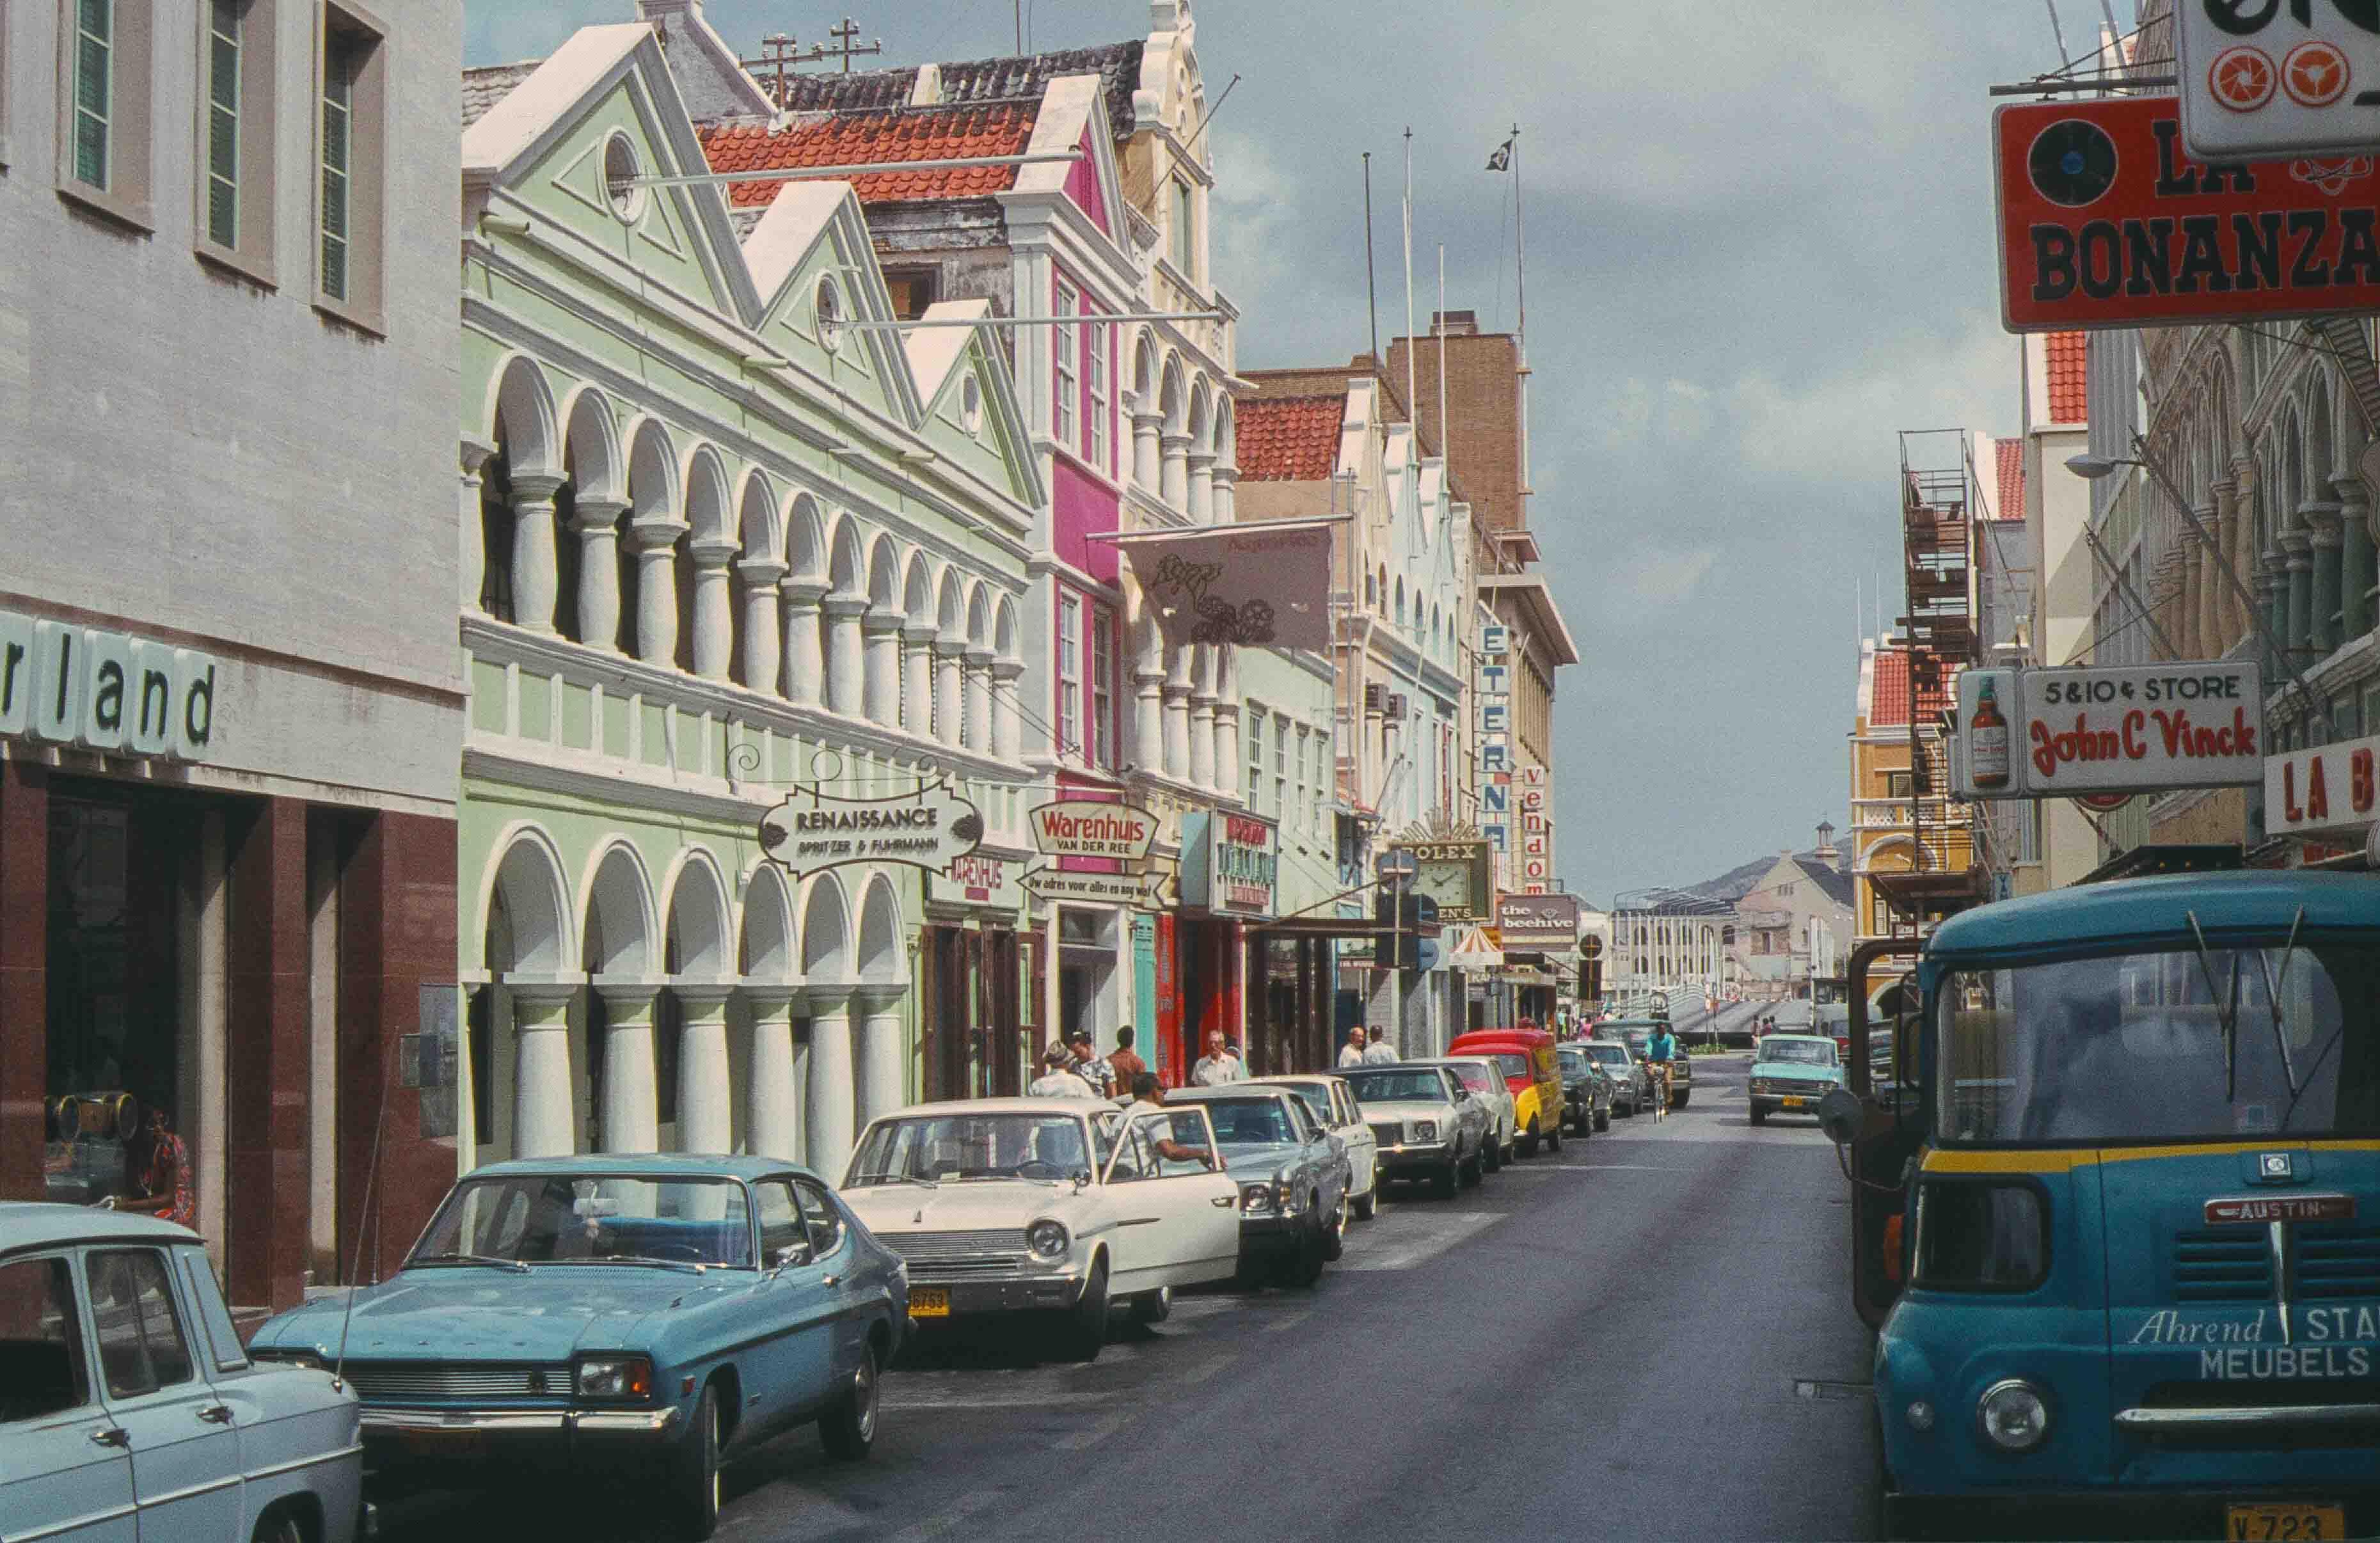 637. Suriname